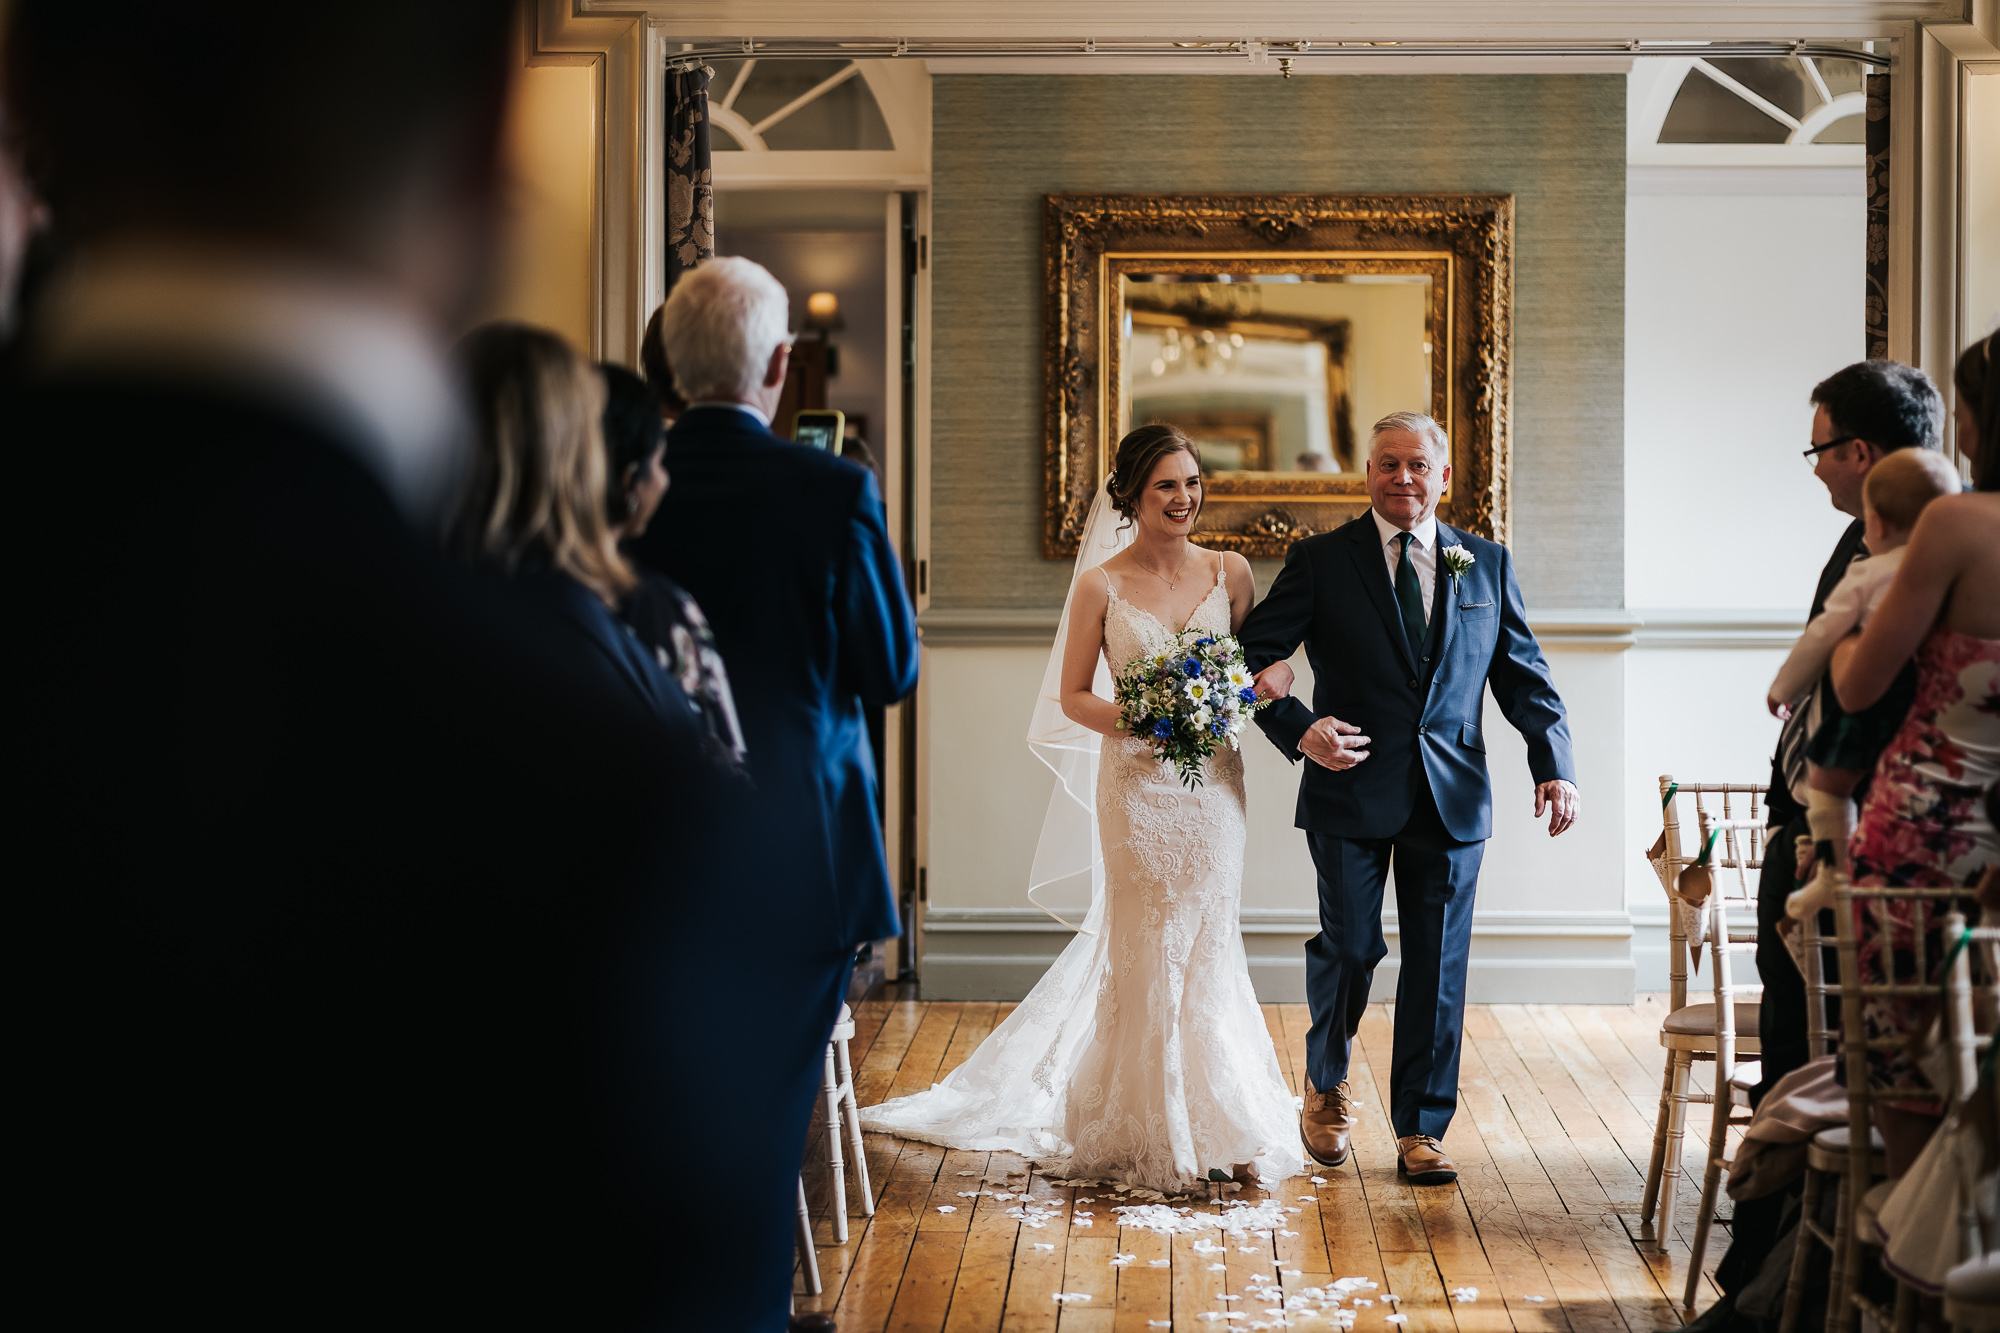 Nunsmere Hall Hotel Wedding photograhpy in cheshire wedding photographer (16 of 42).jpg